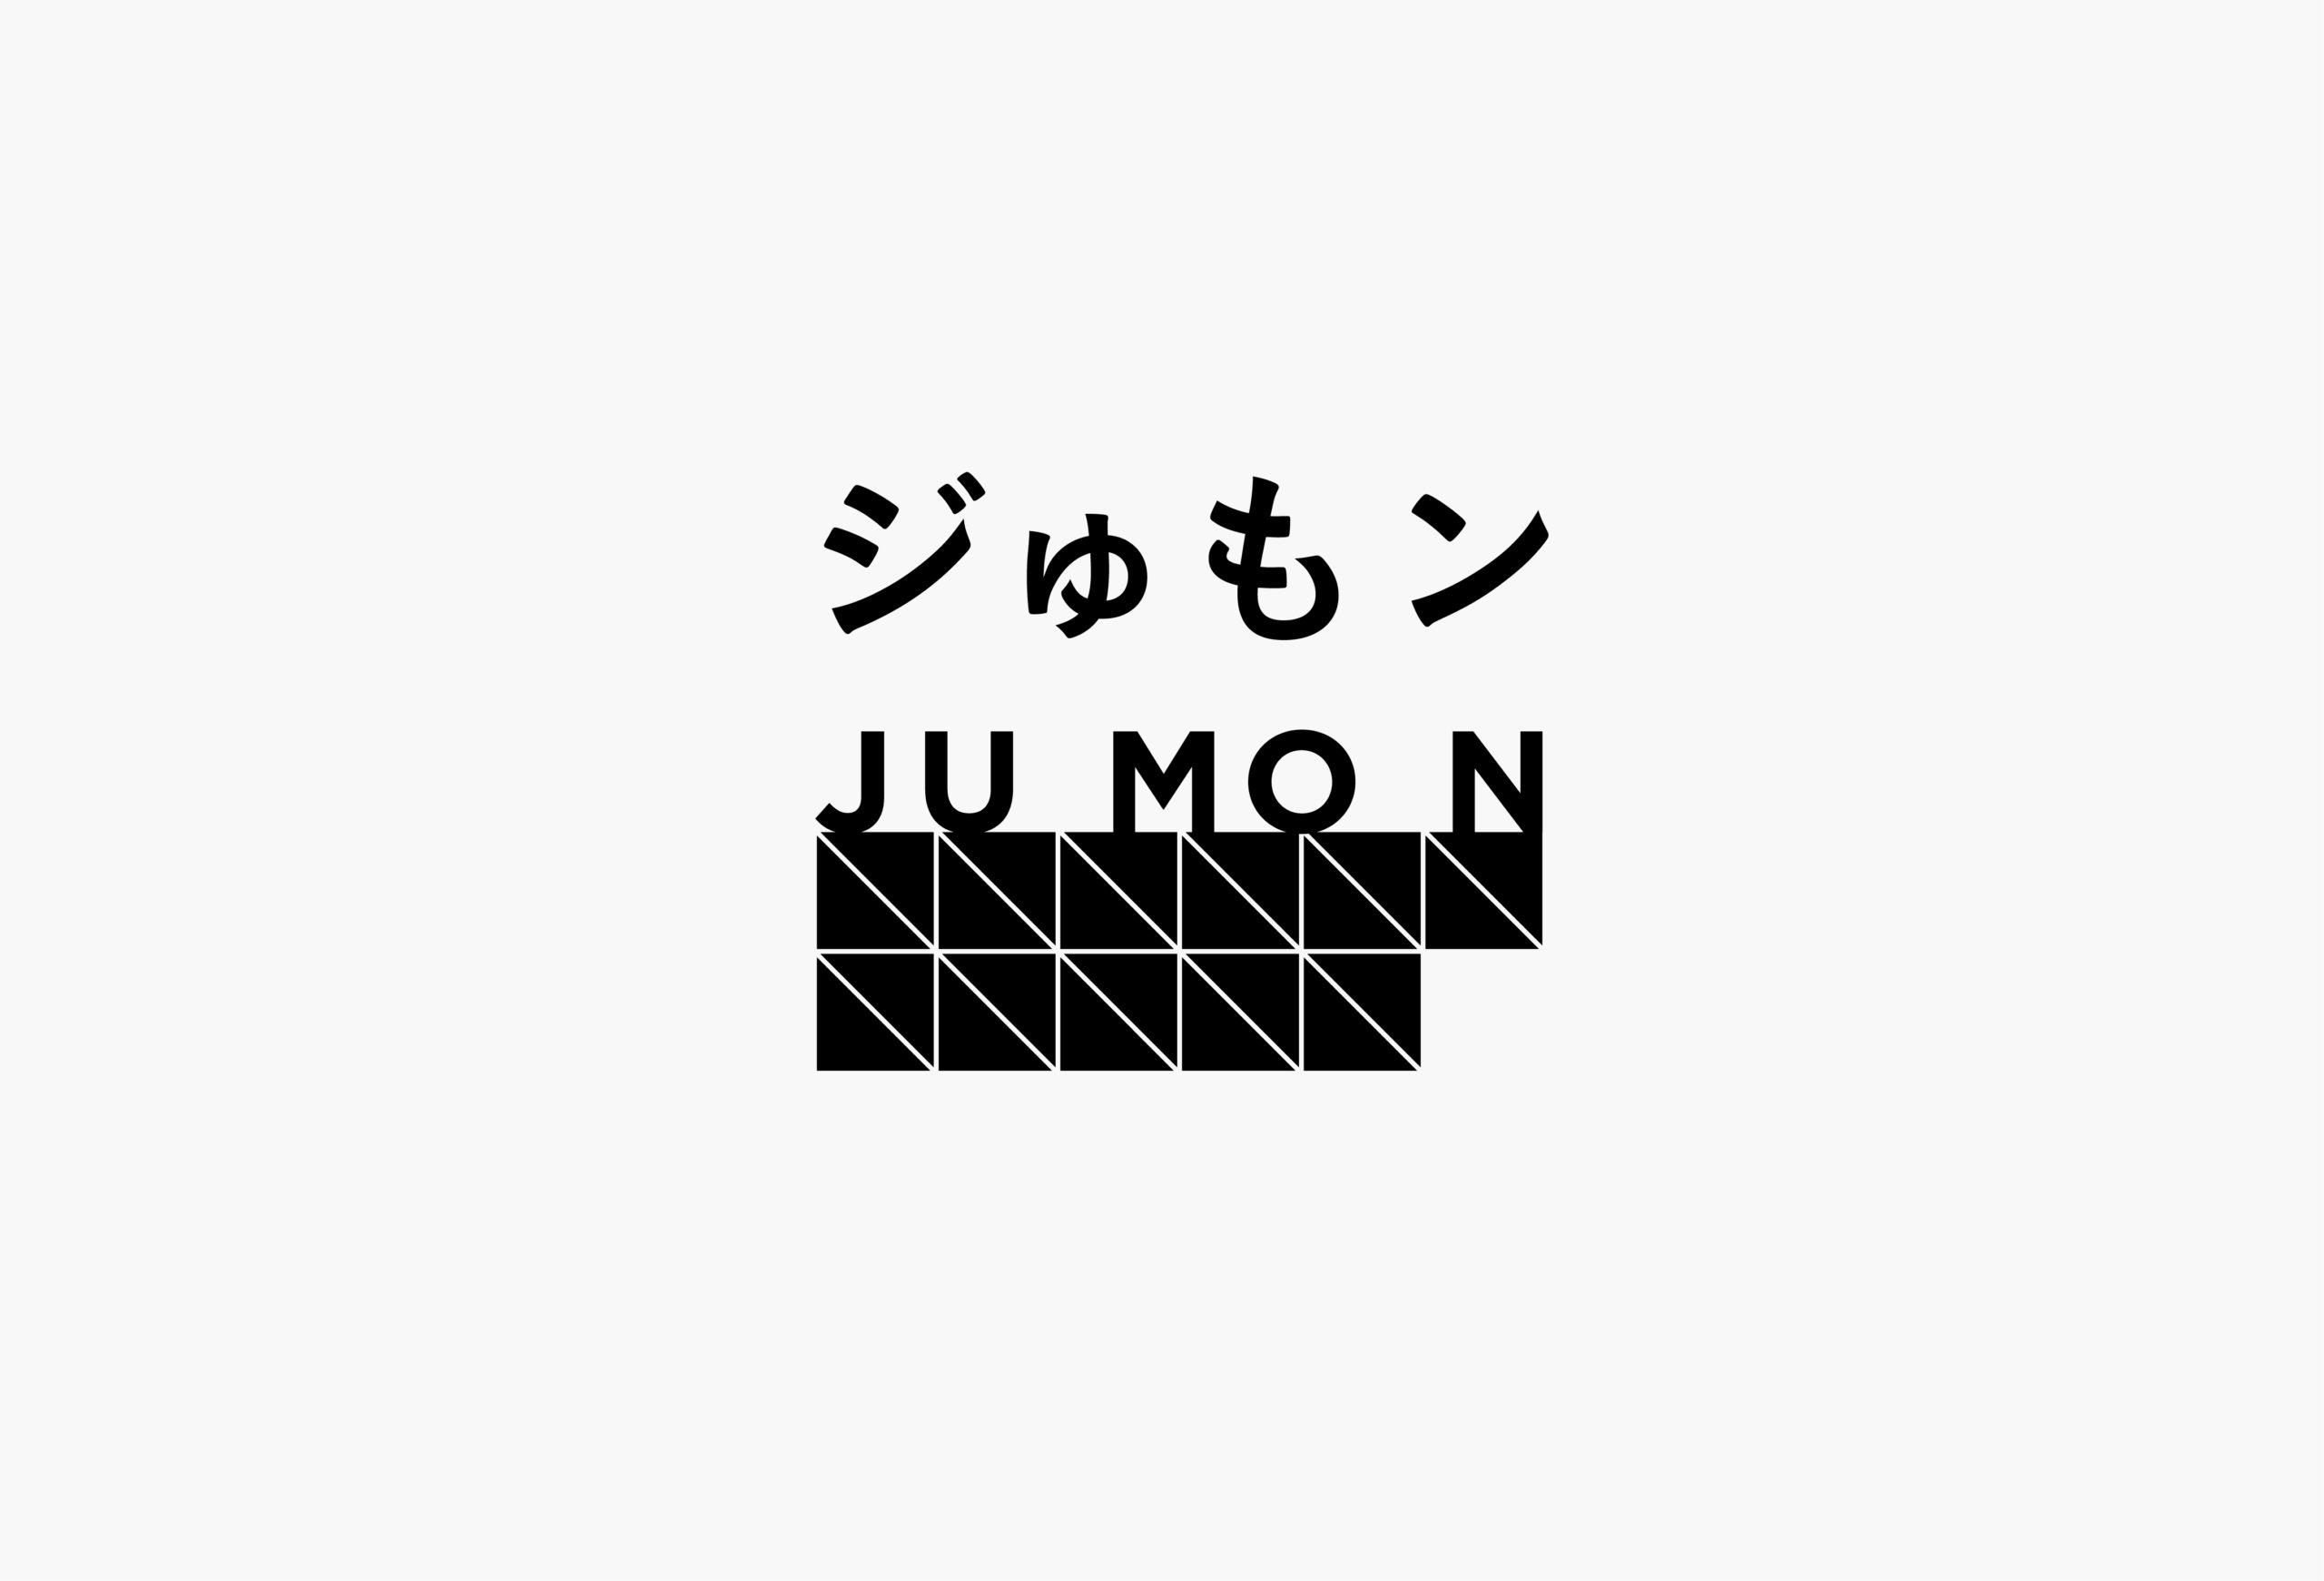 JUMON : Concept web page